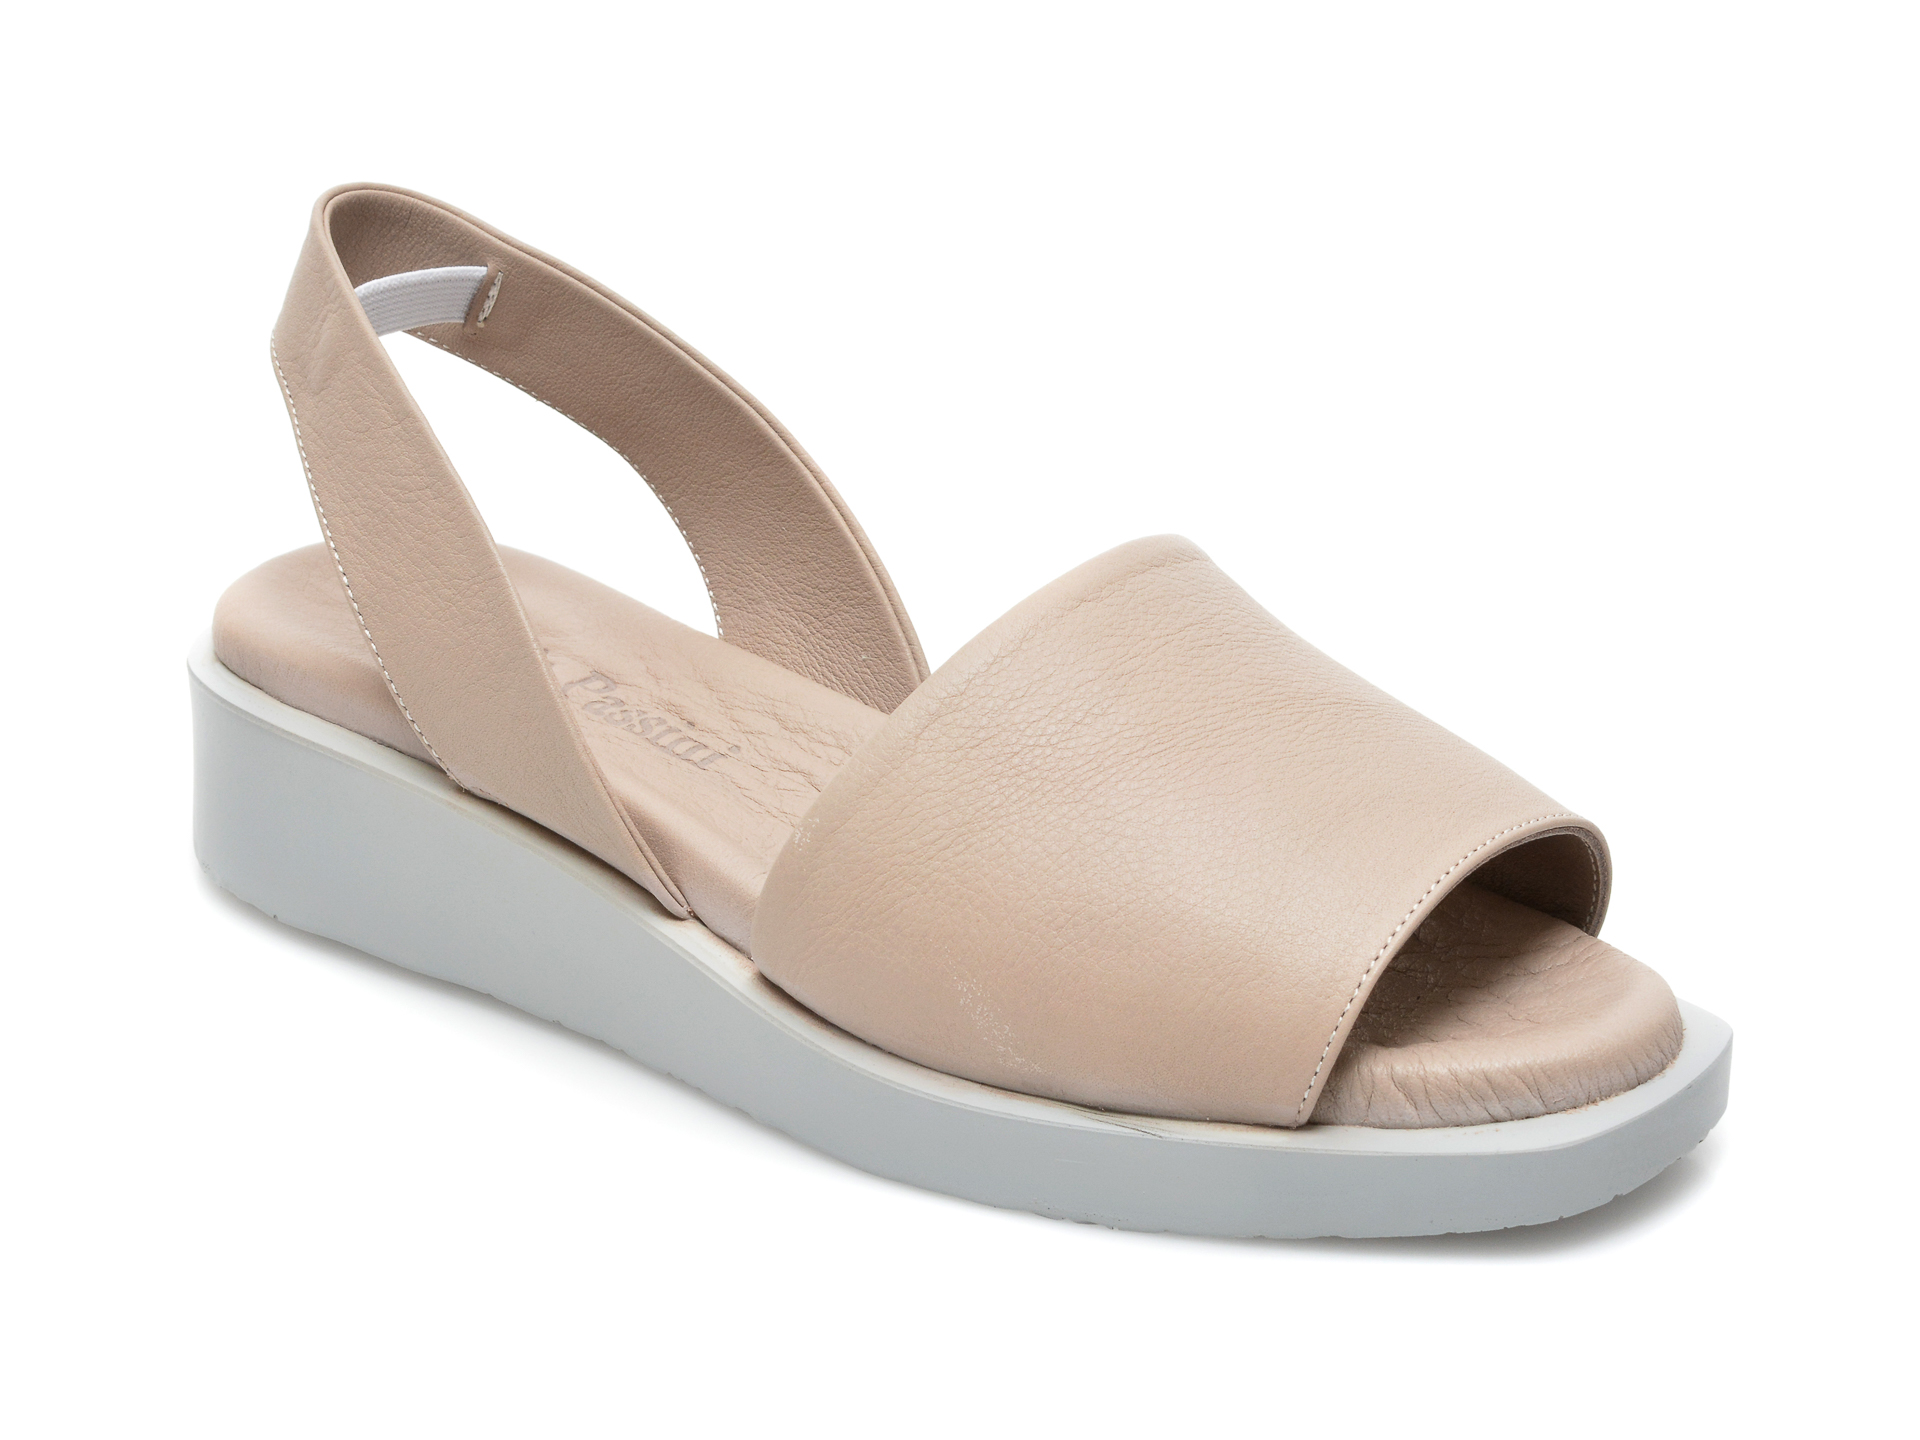 Sandale FLAVIA PASSINI gri, 1582018, din piele naturala imagine otter.ro 2021